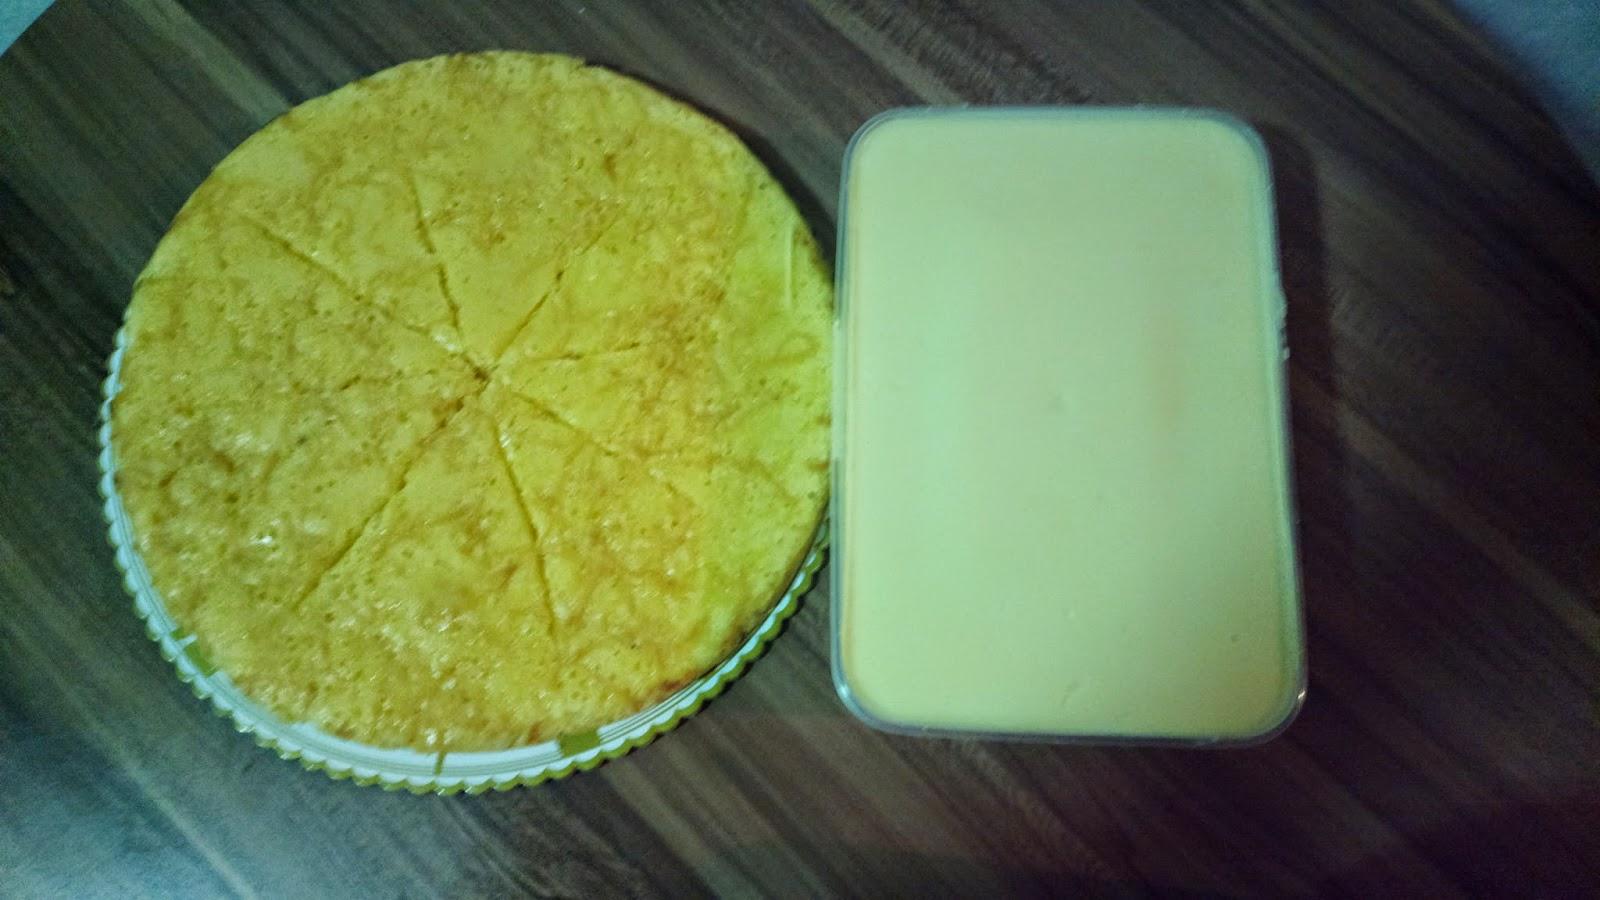 yema cheese pie and cheddar cheese